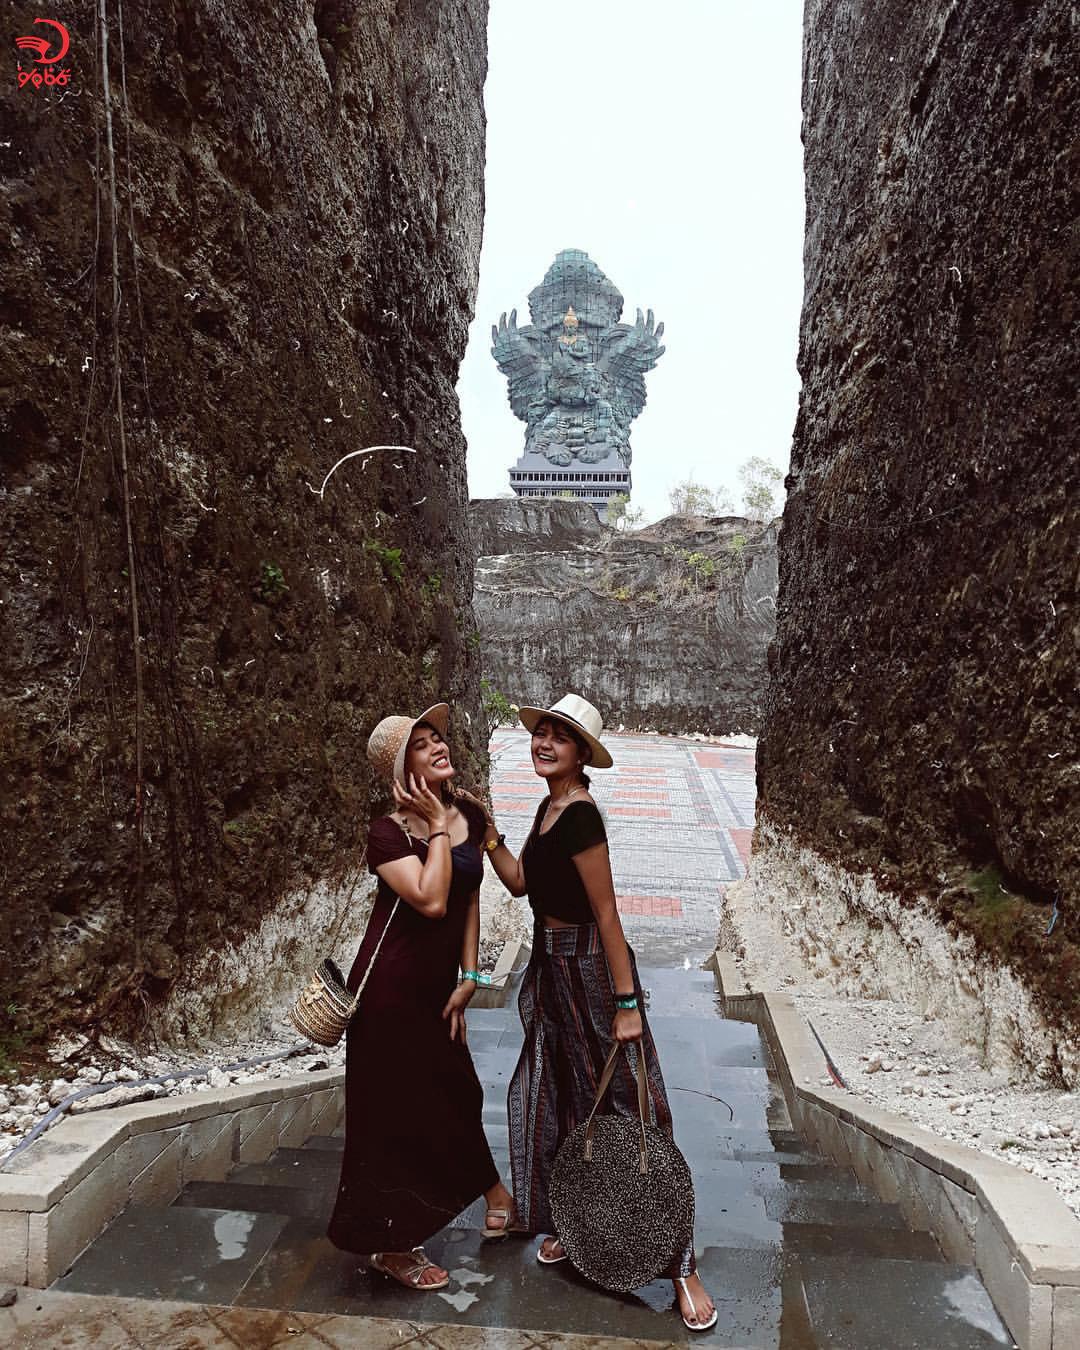 پارک مرکزی جی دبلیو کی بالی